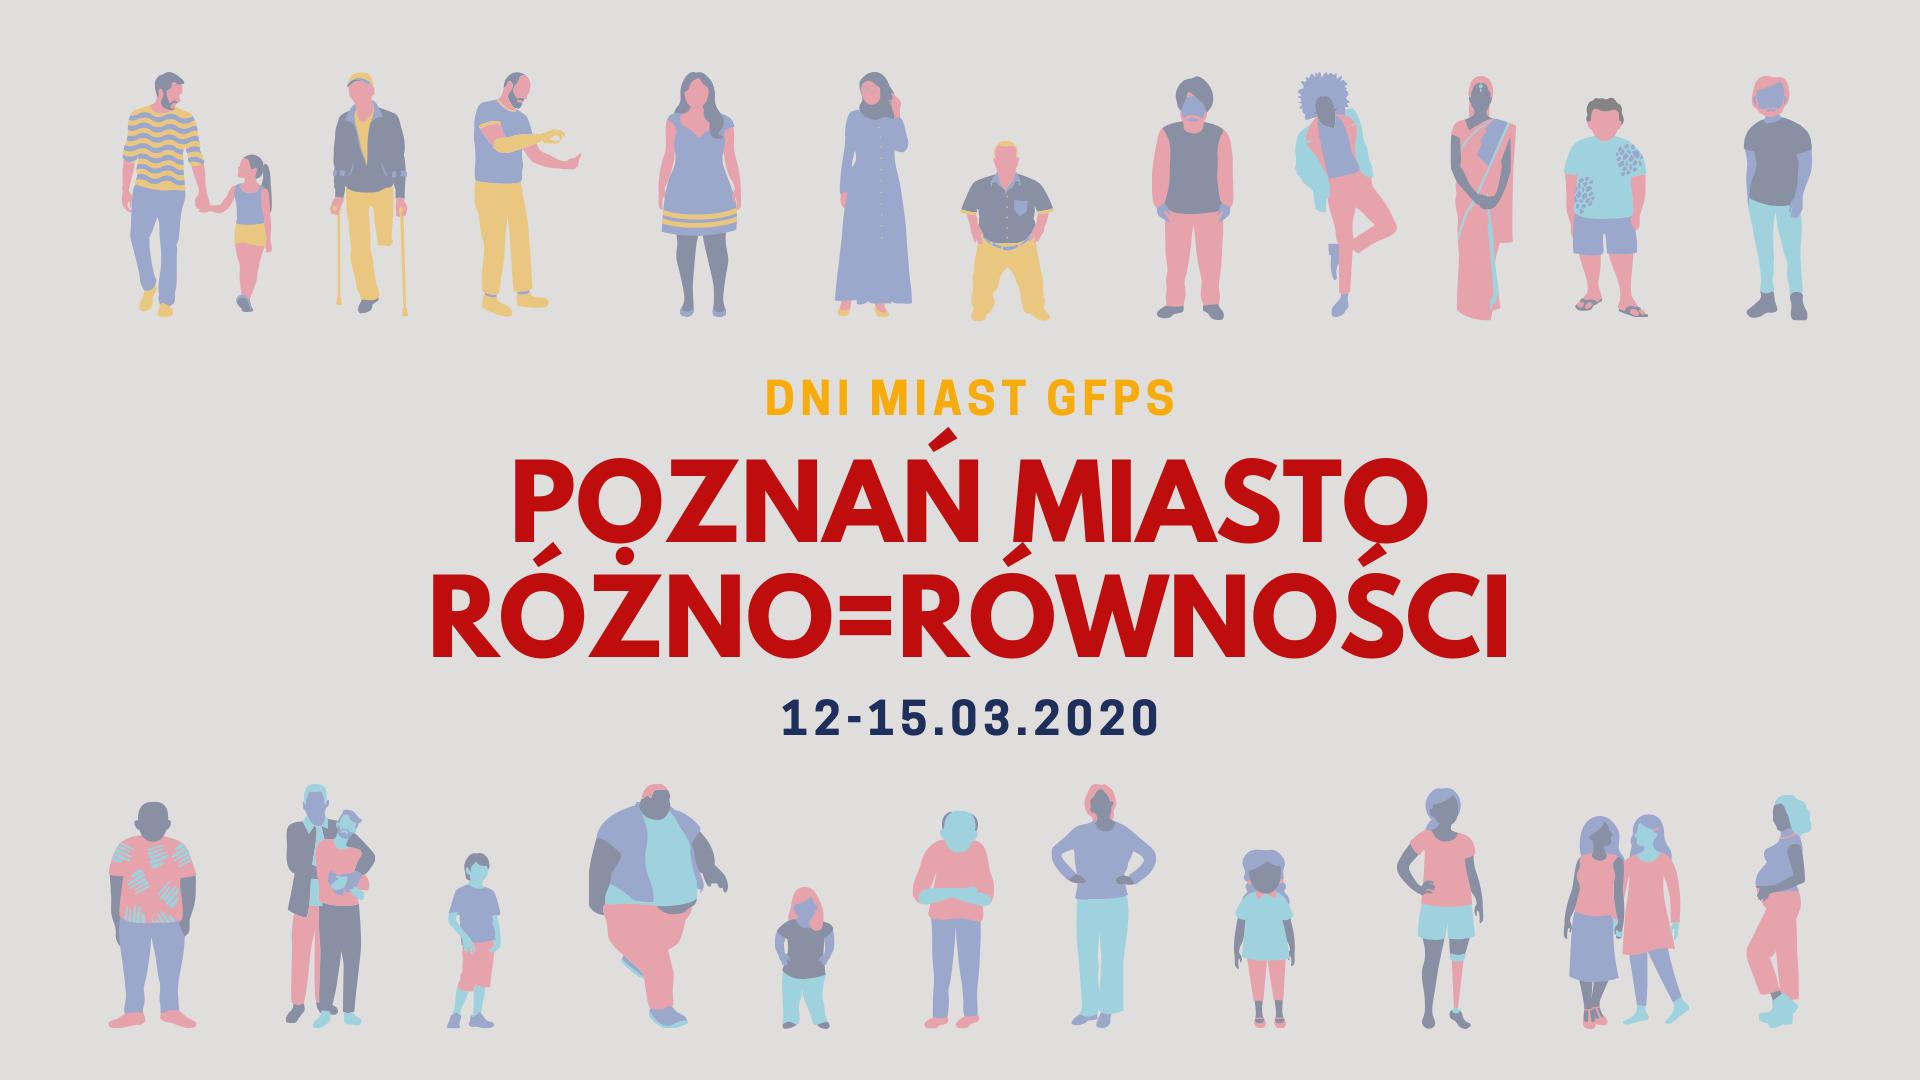 Plakat Dni Miast GFPS Poznań 2020